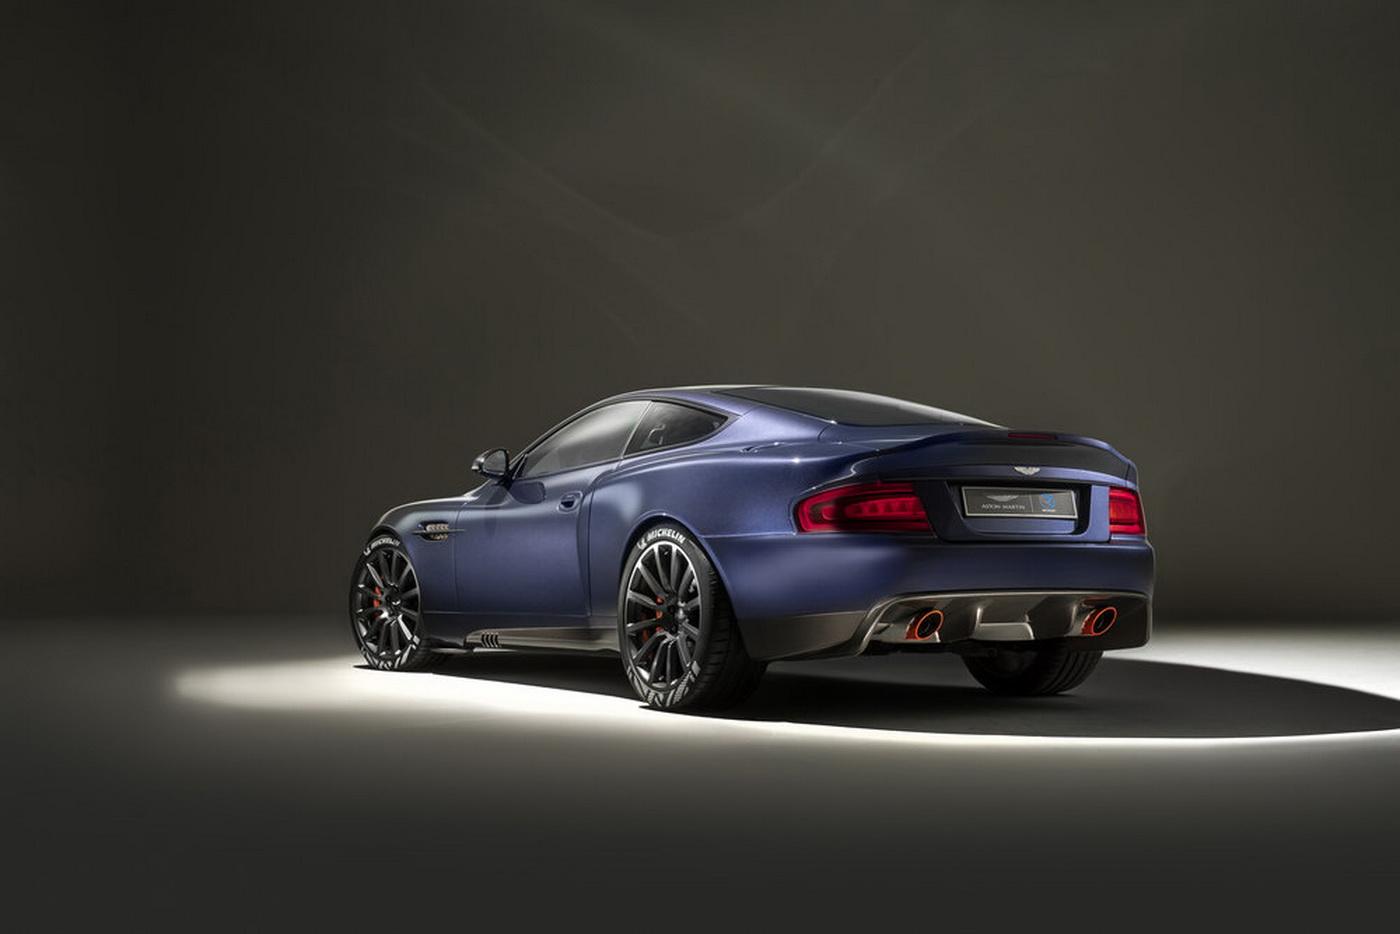 Aston Martin Vanquish 25 Rear